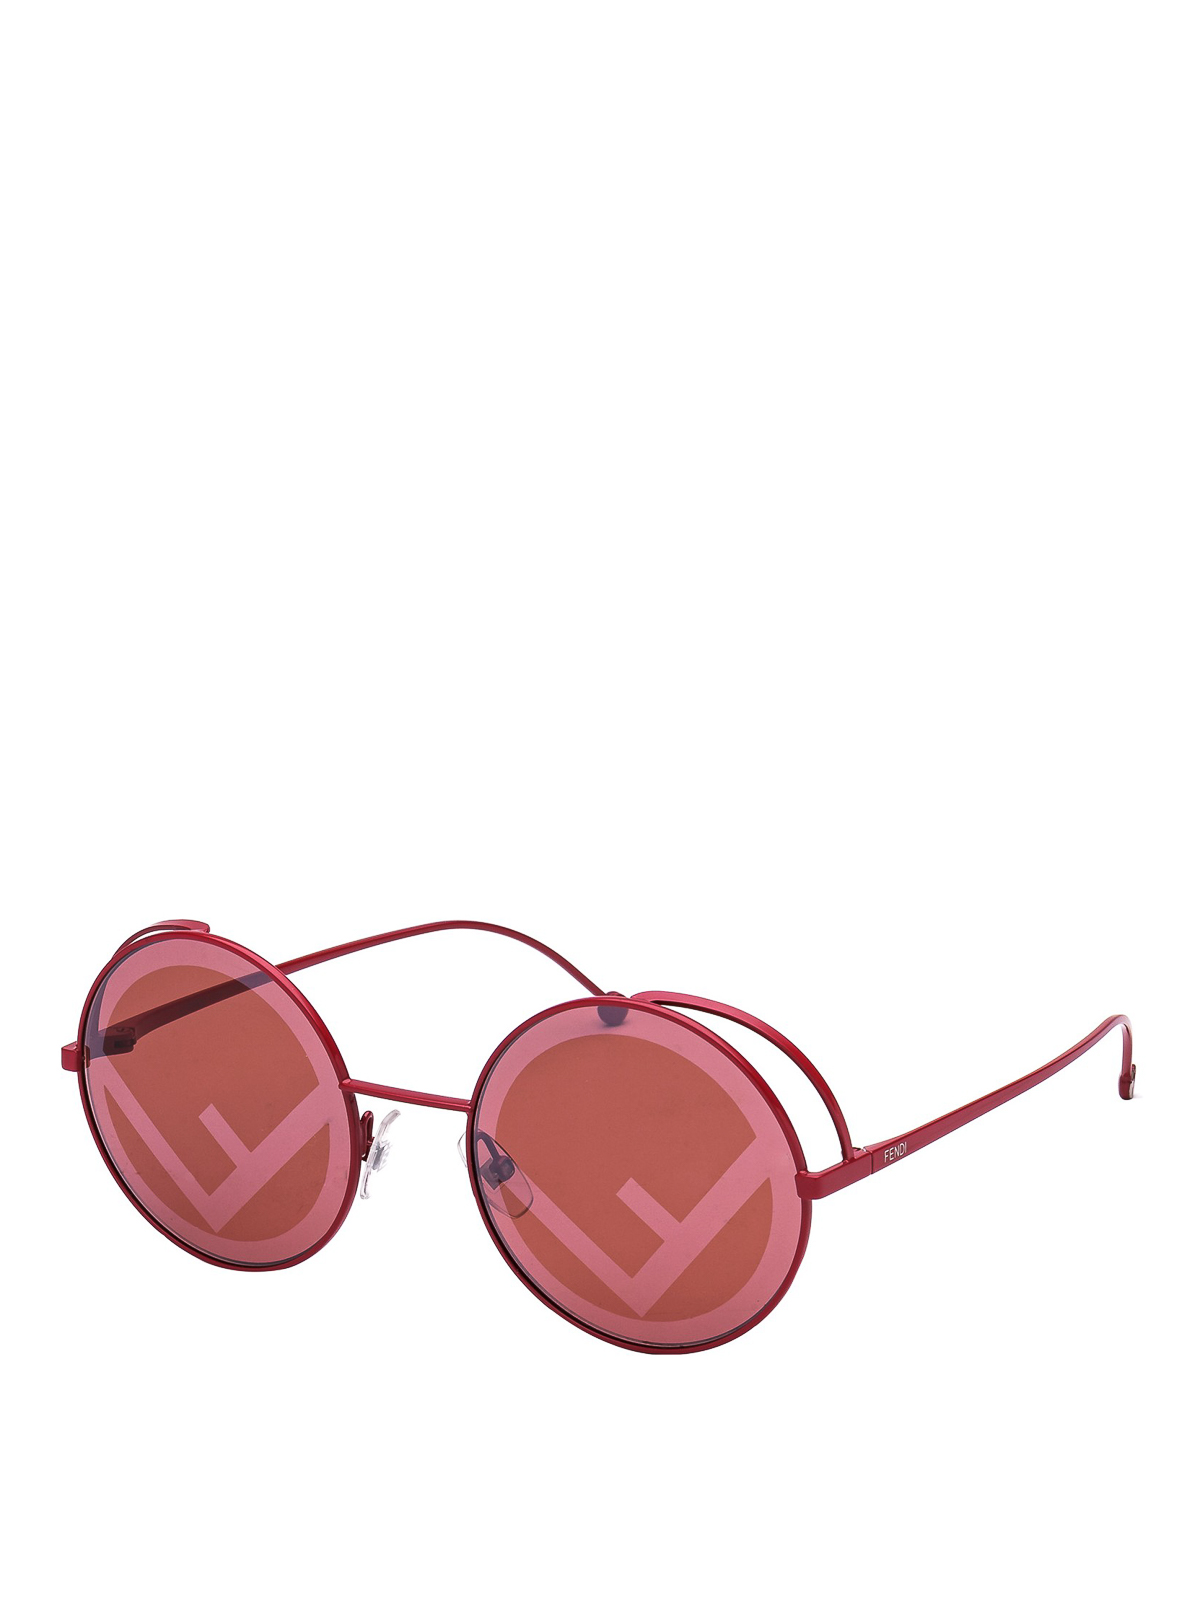 5e34f8516234 Fendi - Fendirama red sunglasses - sunglasses - FF0343SC9A0L | iKRIX.com